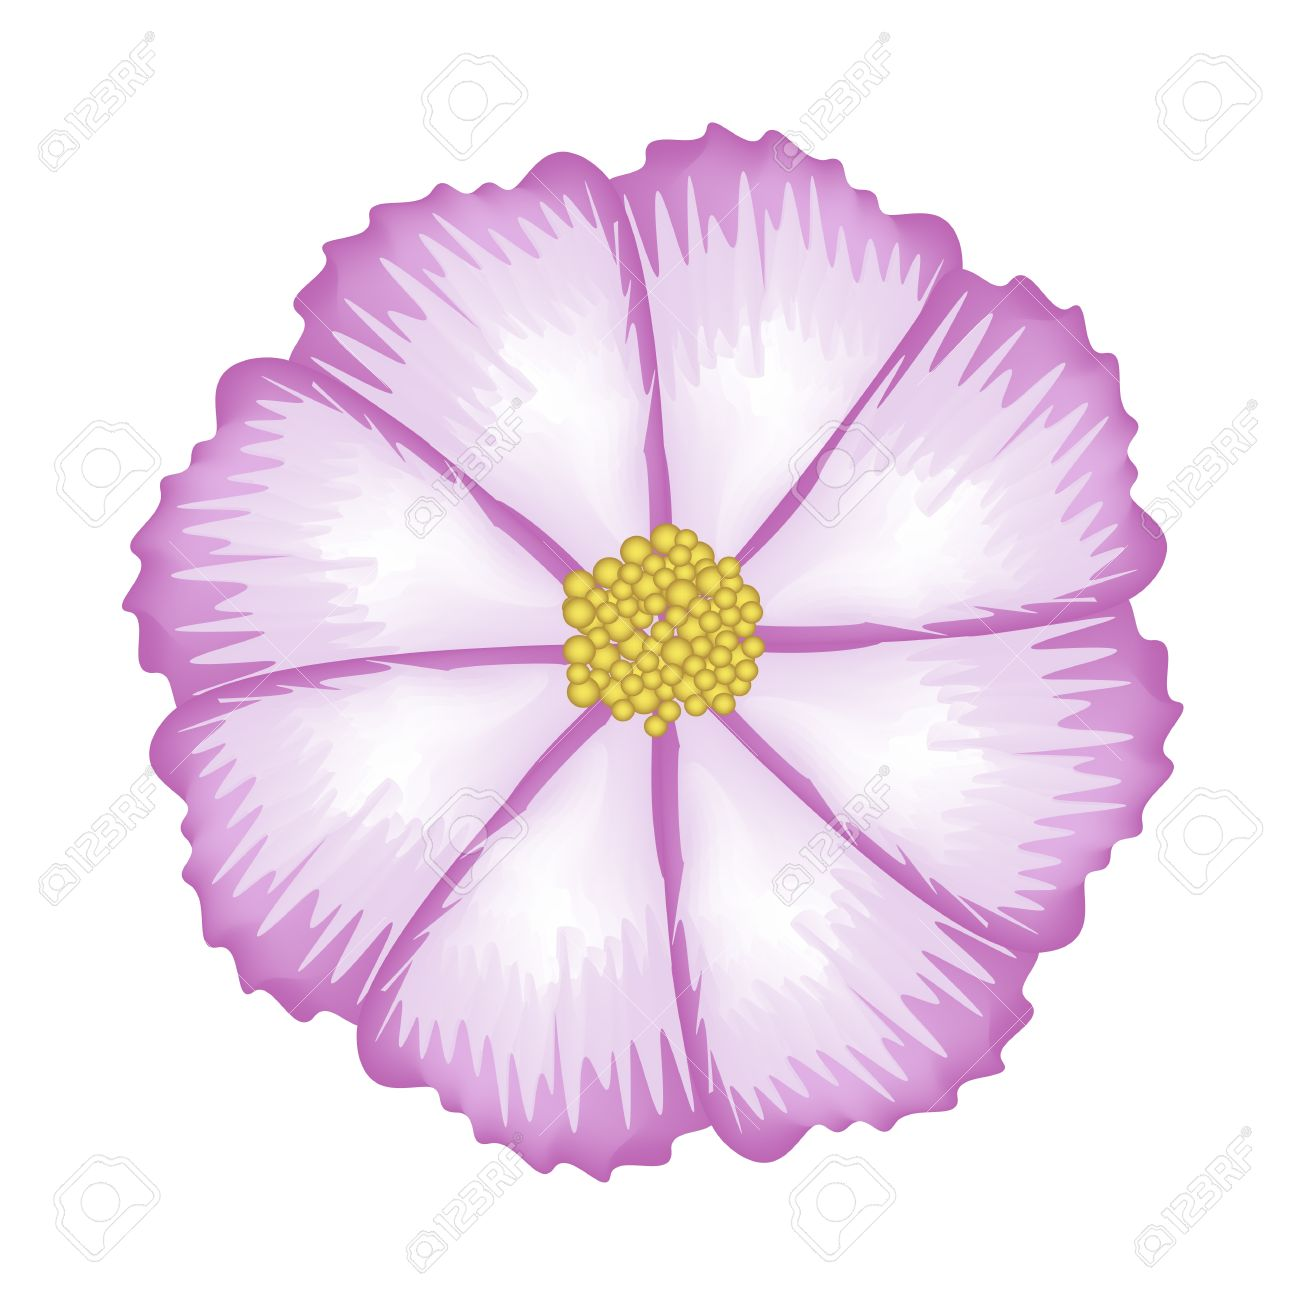 Symbol Of Love, Illustration Of Bright And Beautiful Fuchsia.